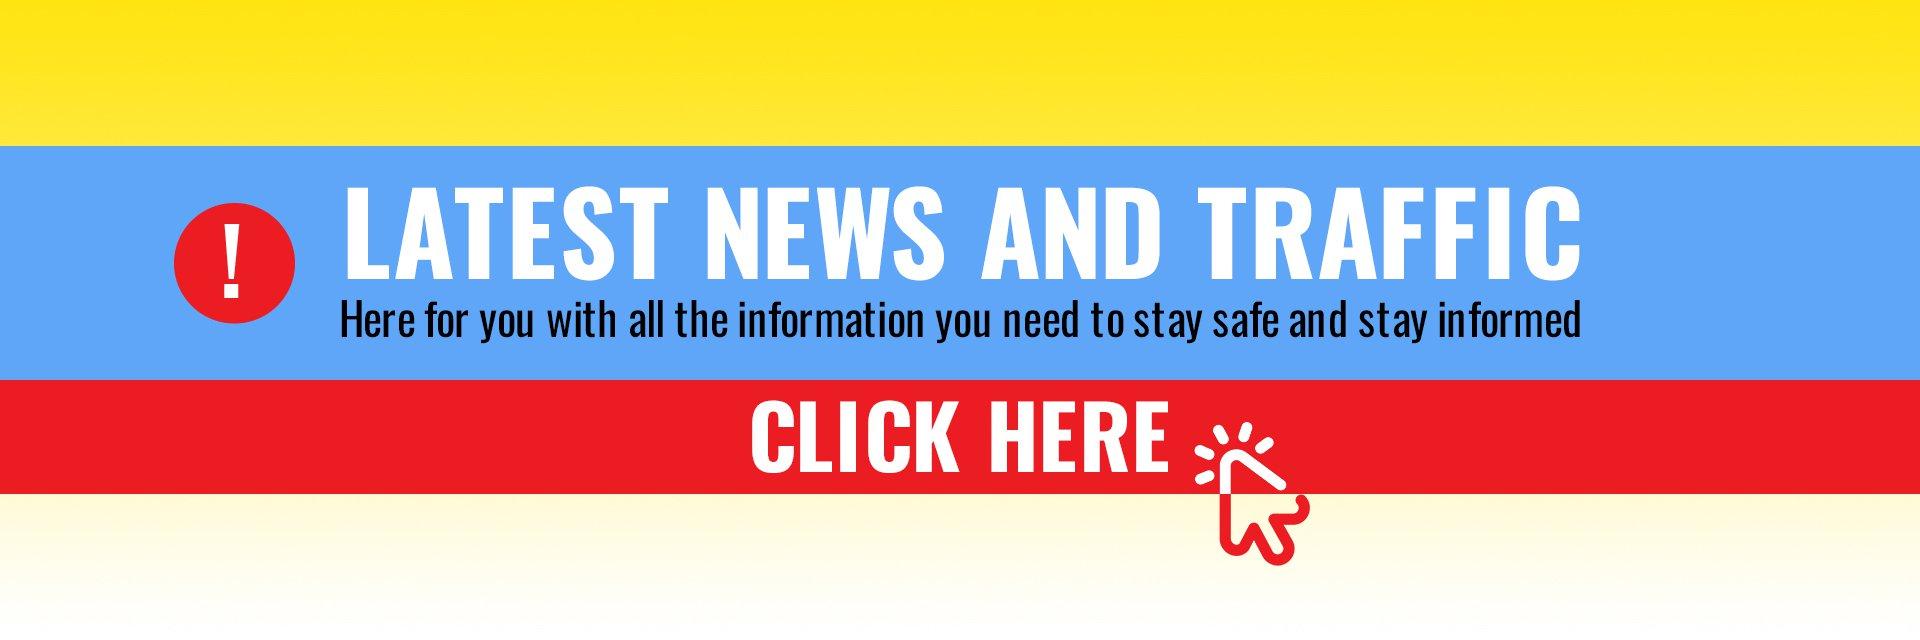 NEWS TRAFFIC WEB BANNER